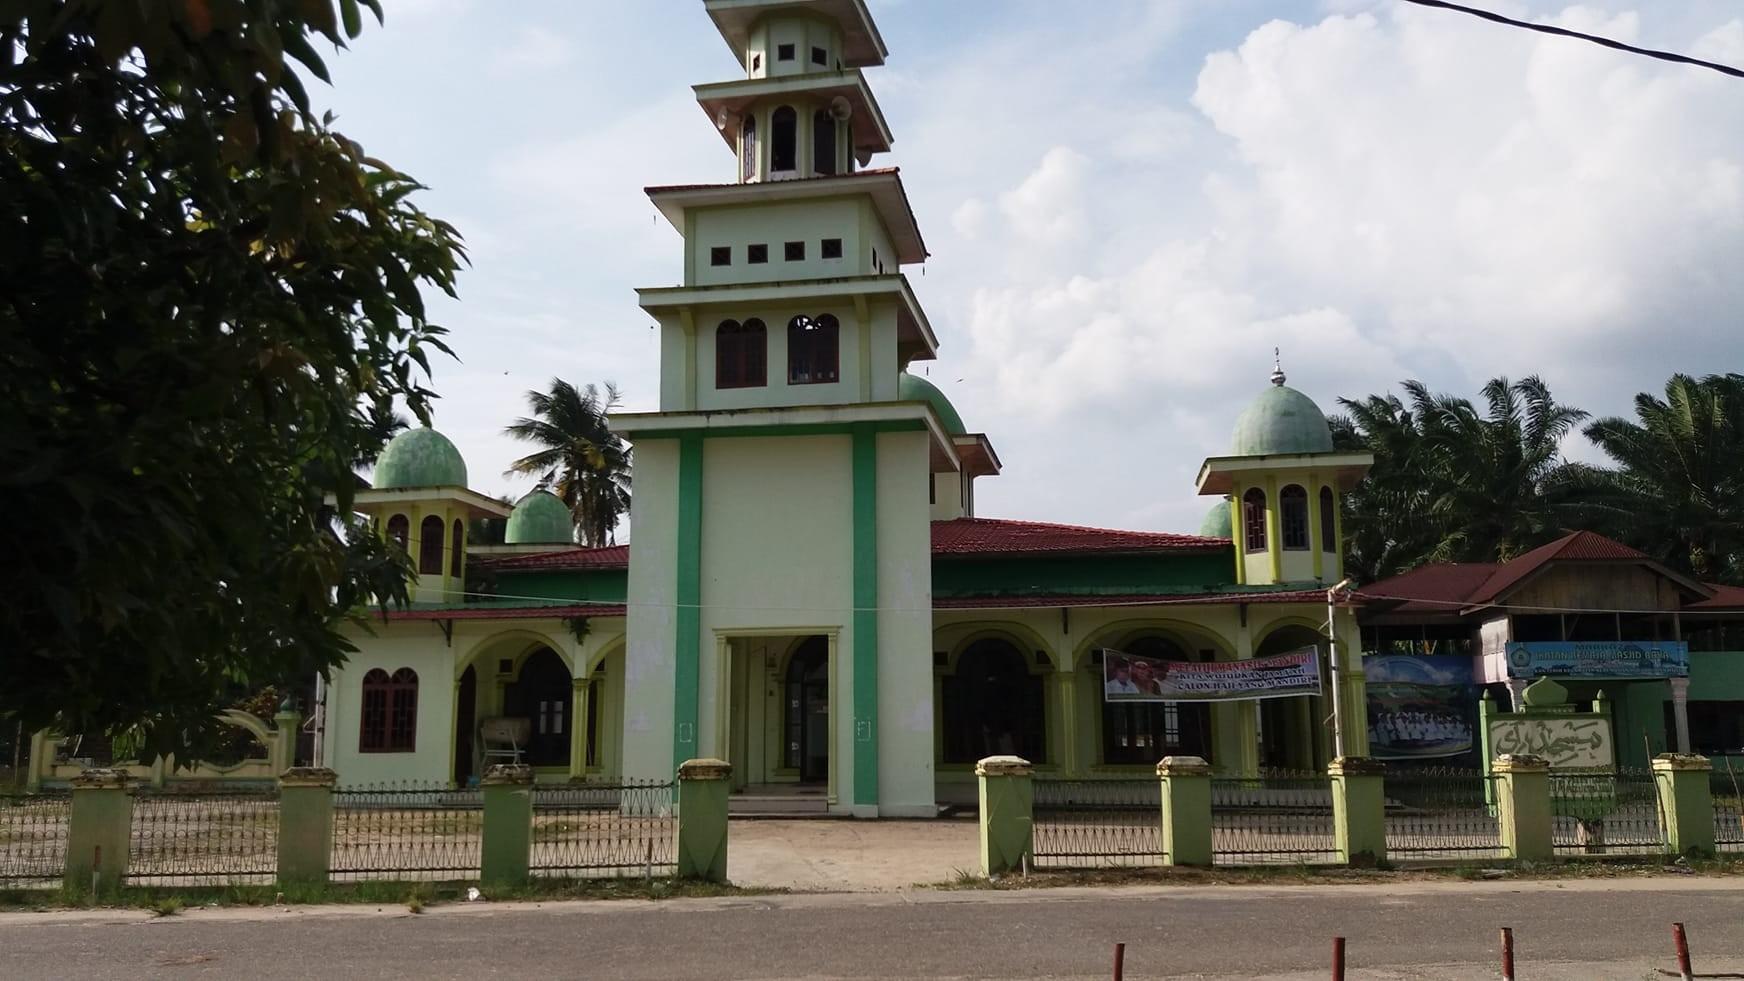 Masjid Raya Pekan Tebih